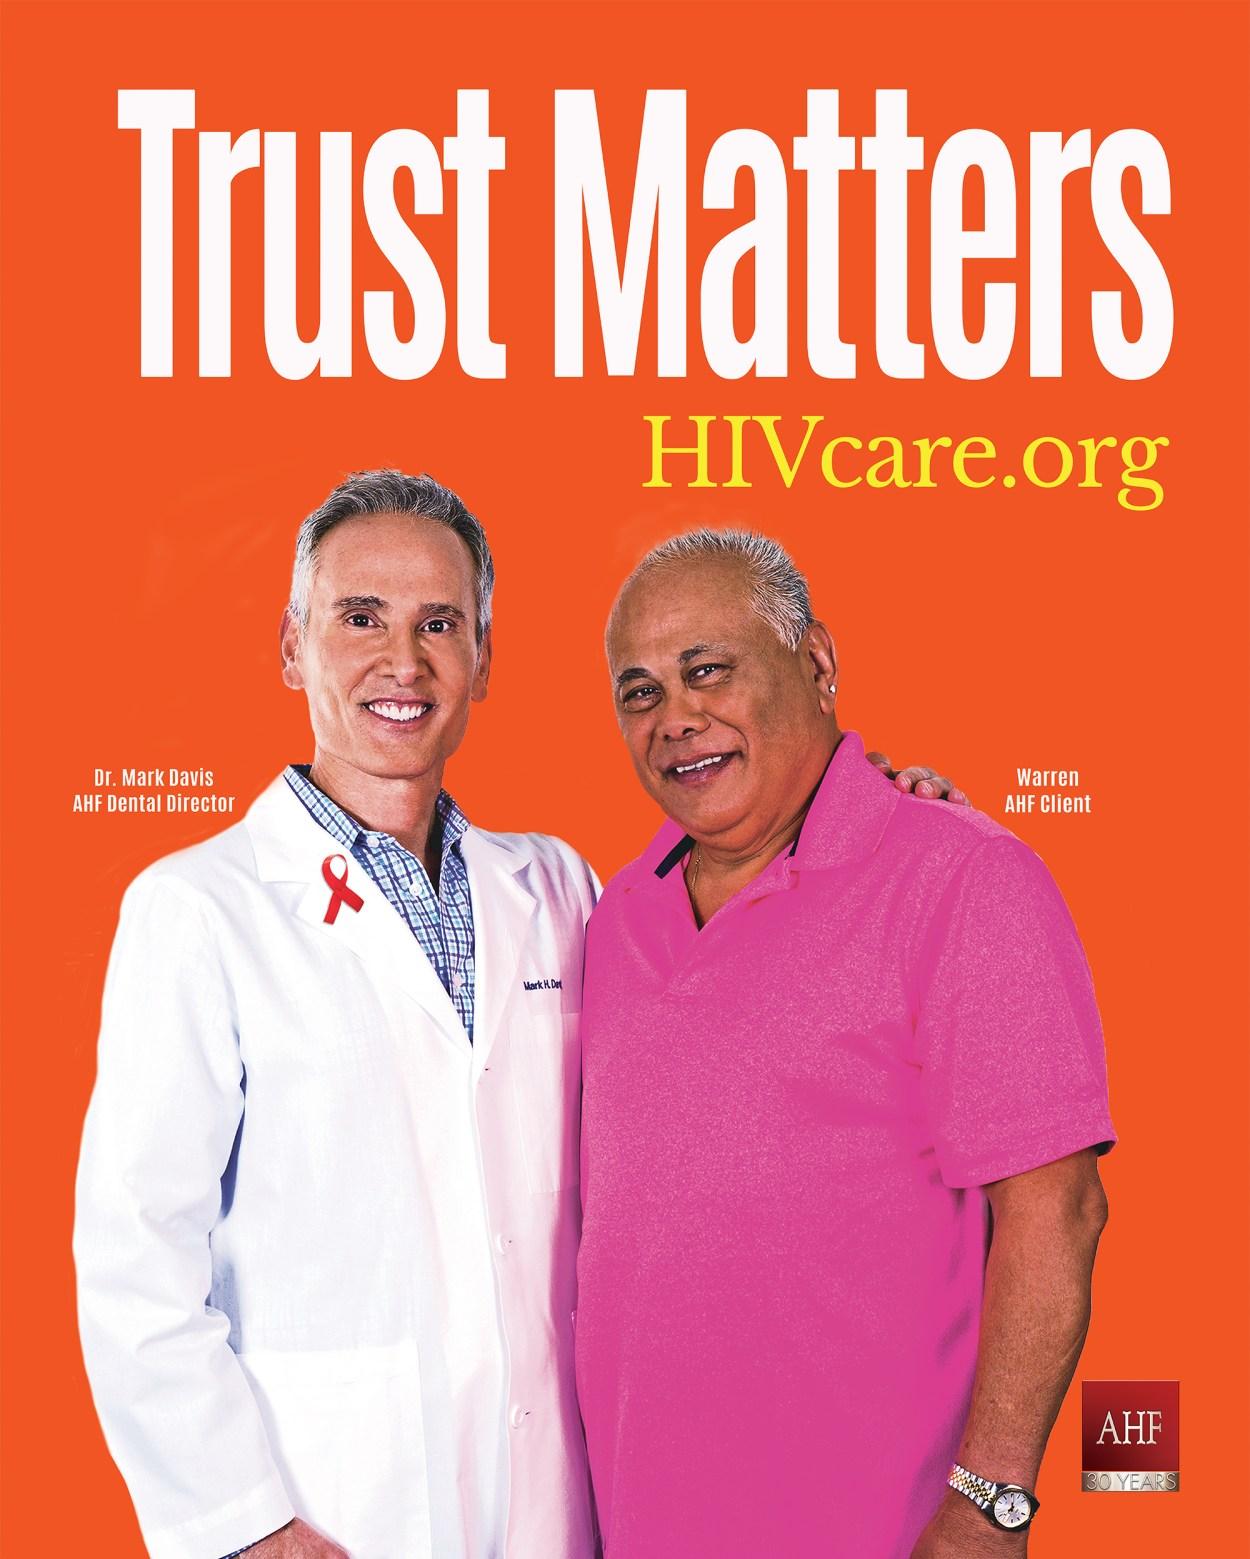 Trust Matters 24×30 Mark Davis